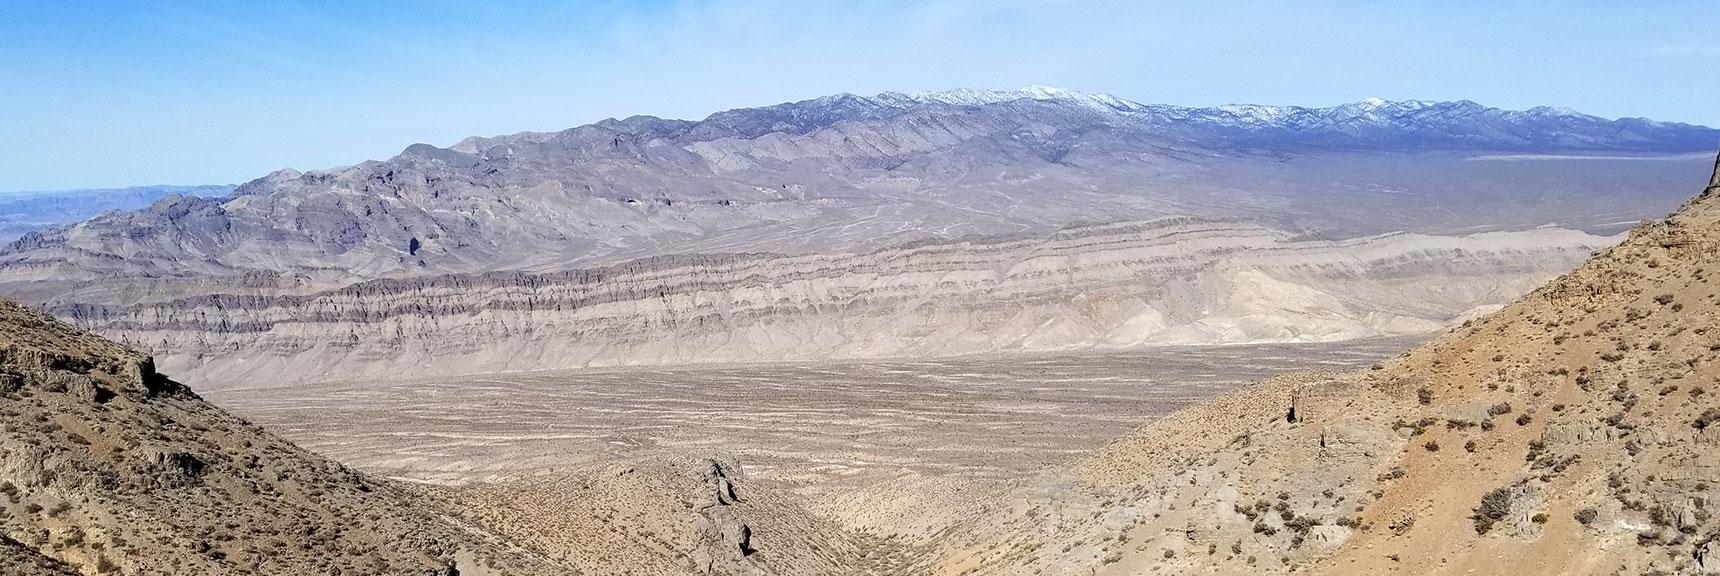 Sheep Range Looking Down North Trail Canyon on Gass Peak, Nevada